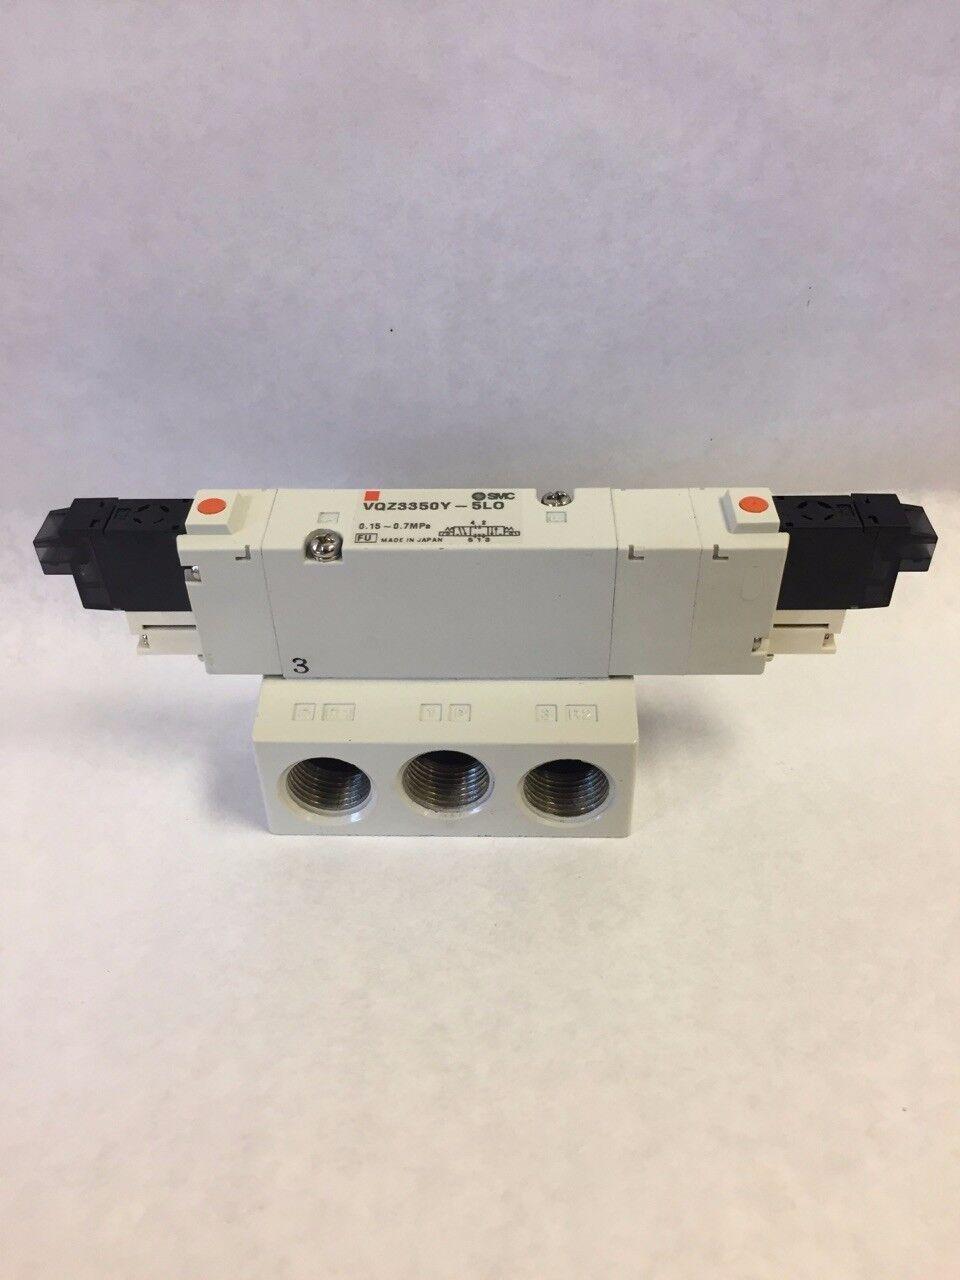 SOL 4//5-PORT*** VQZ2000 VALVE SMC VQZ2151-5LJ1 valve base mount dc